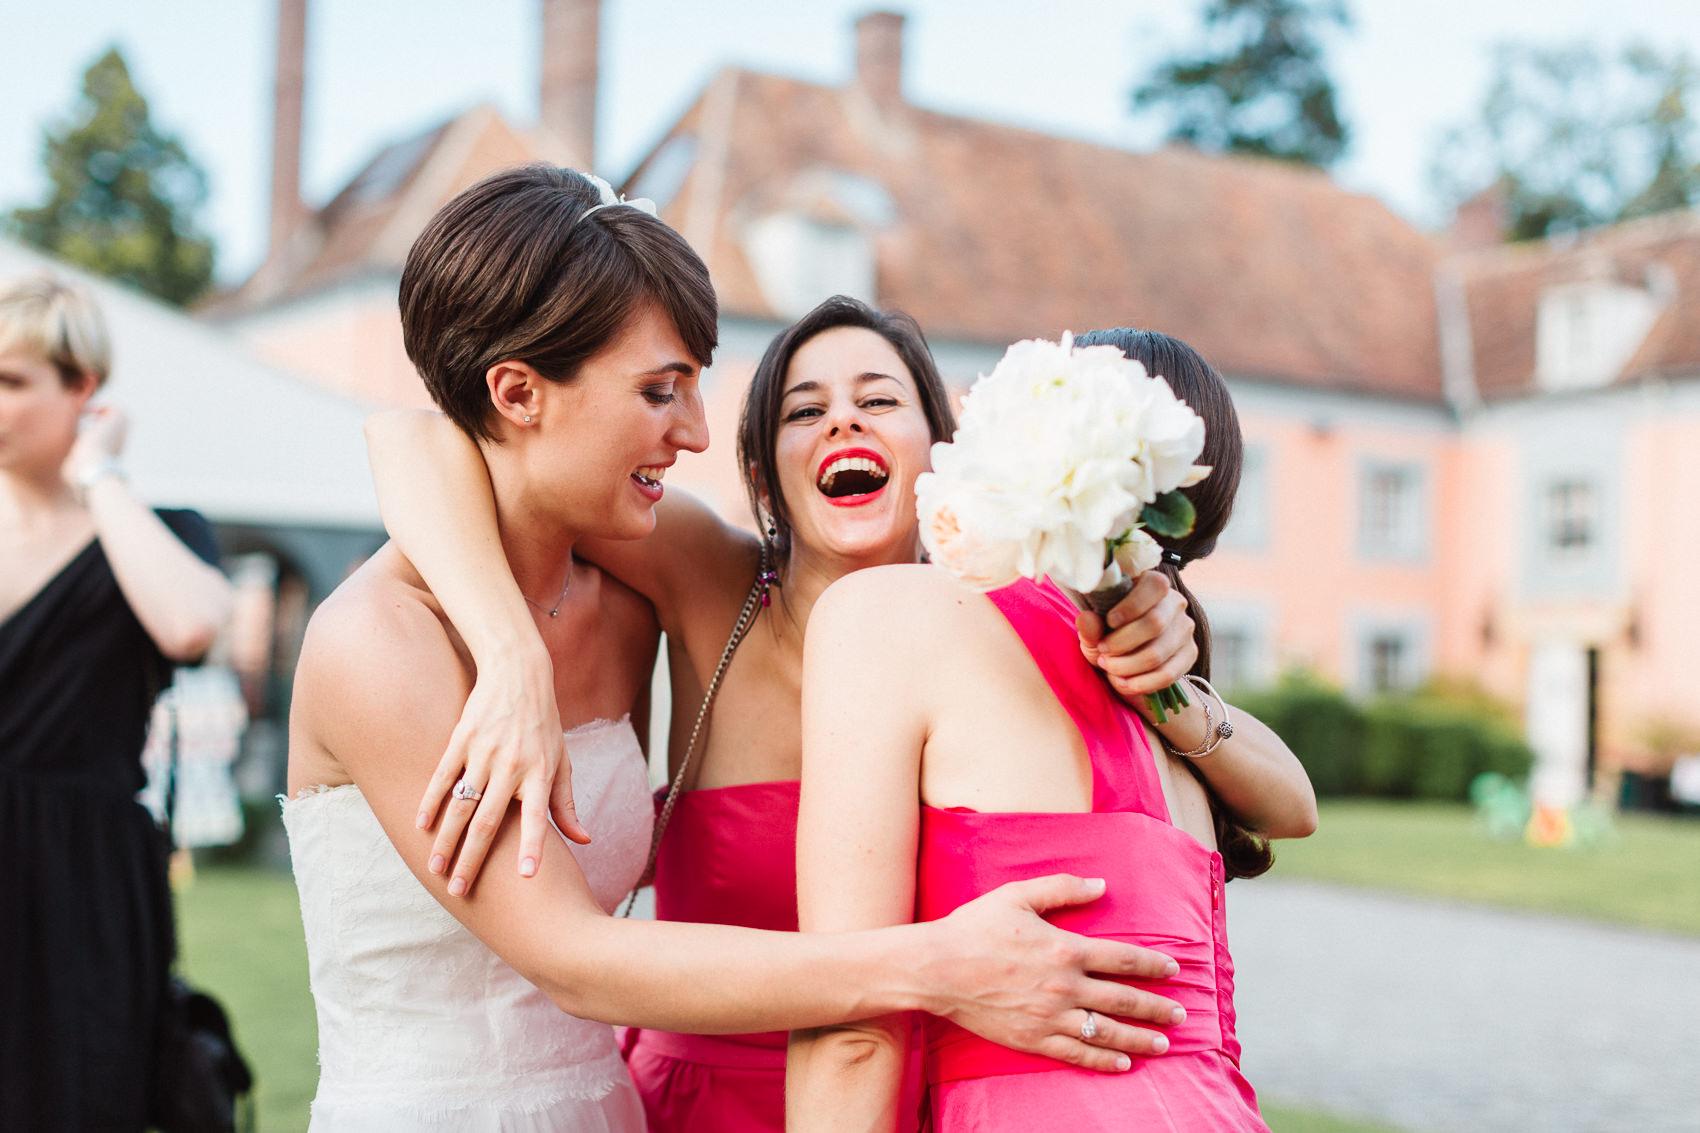 mariage-charlotte-et-joel-trendzphotography-098